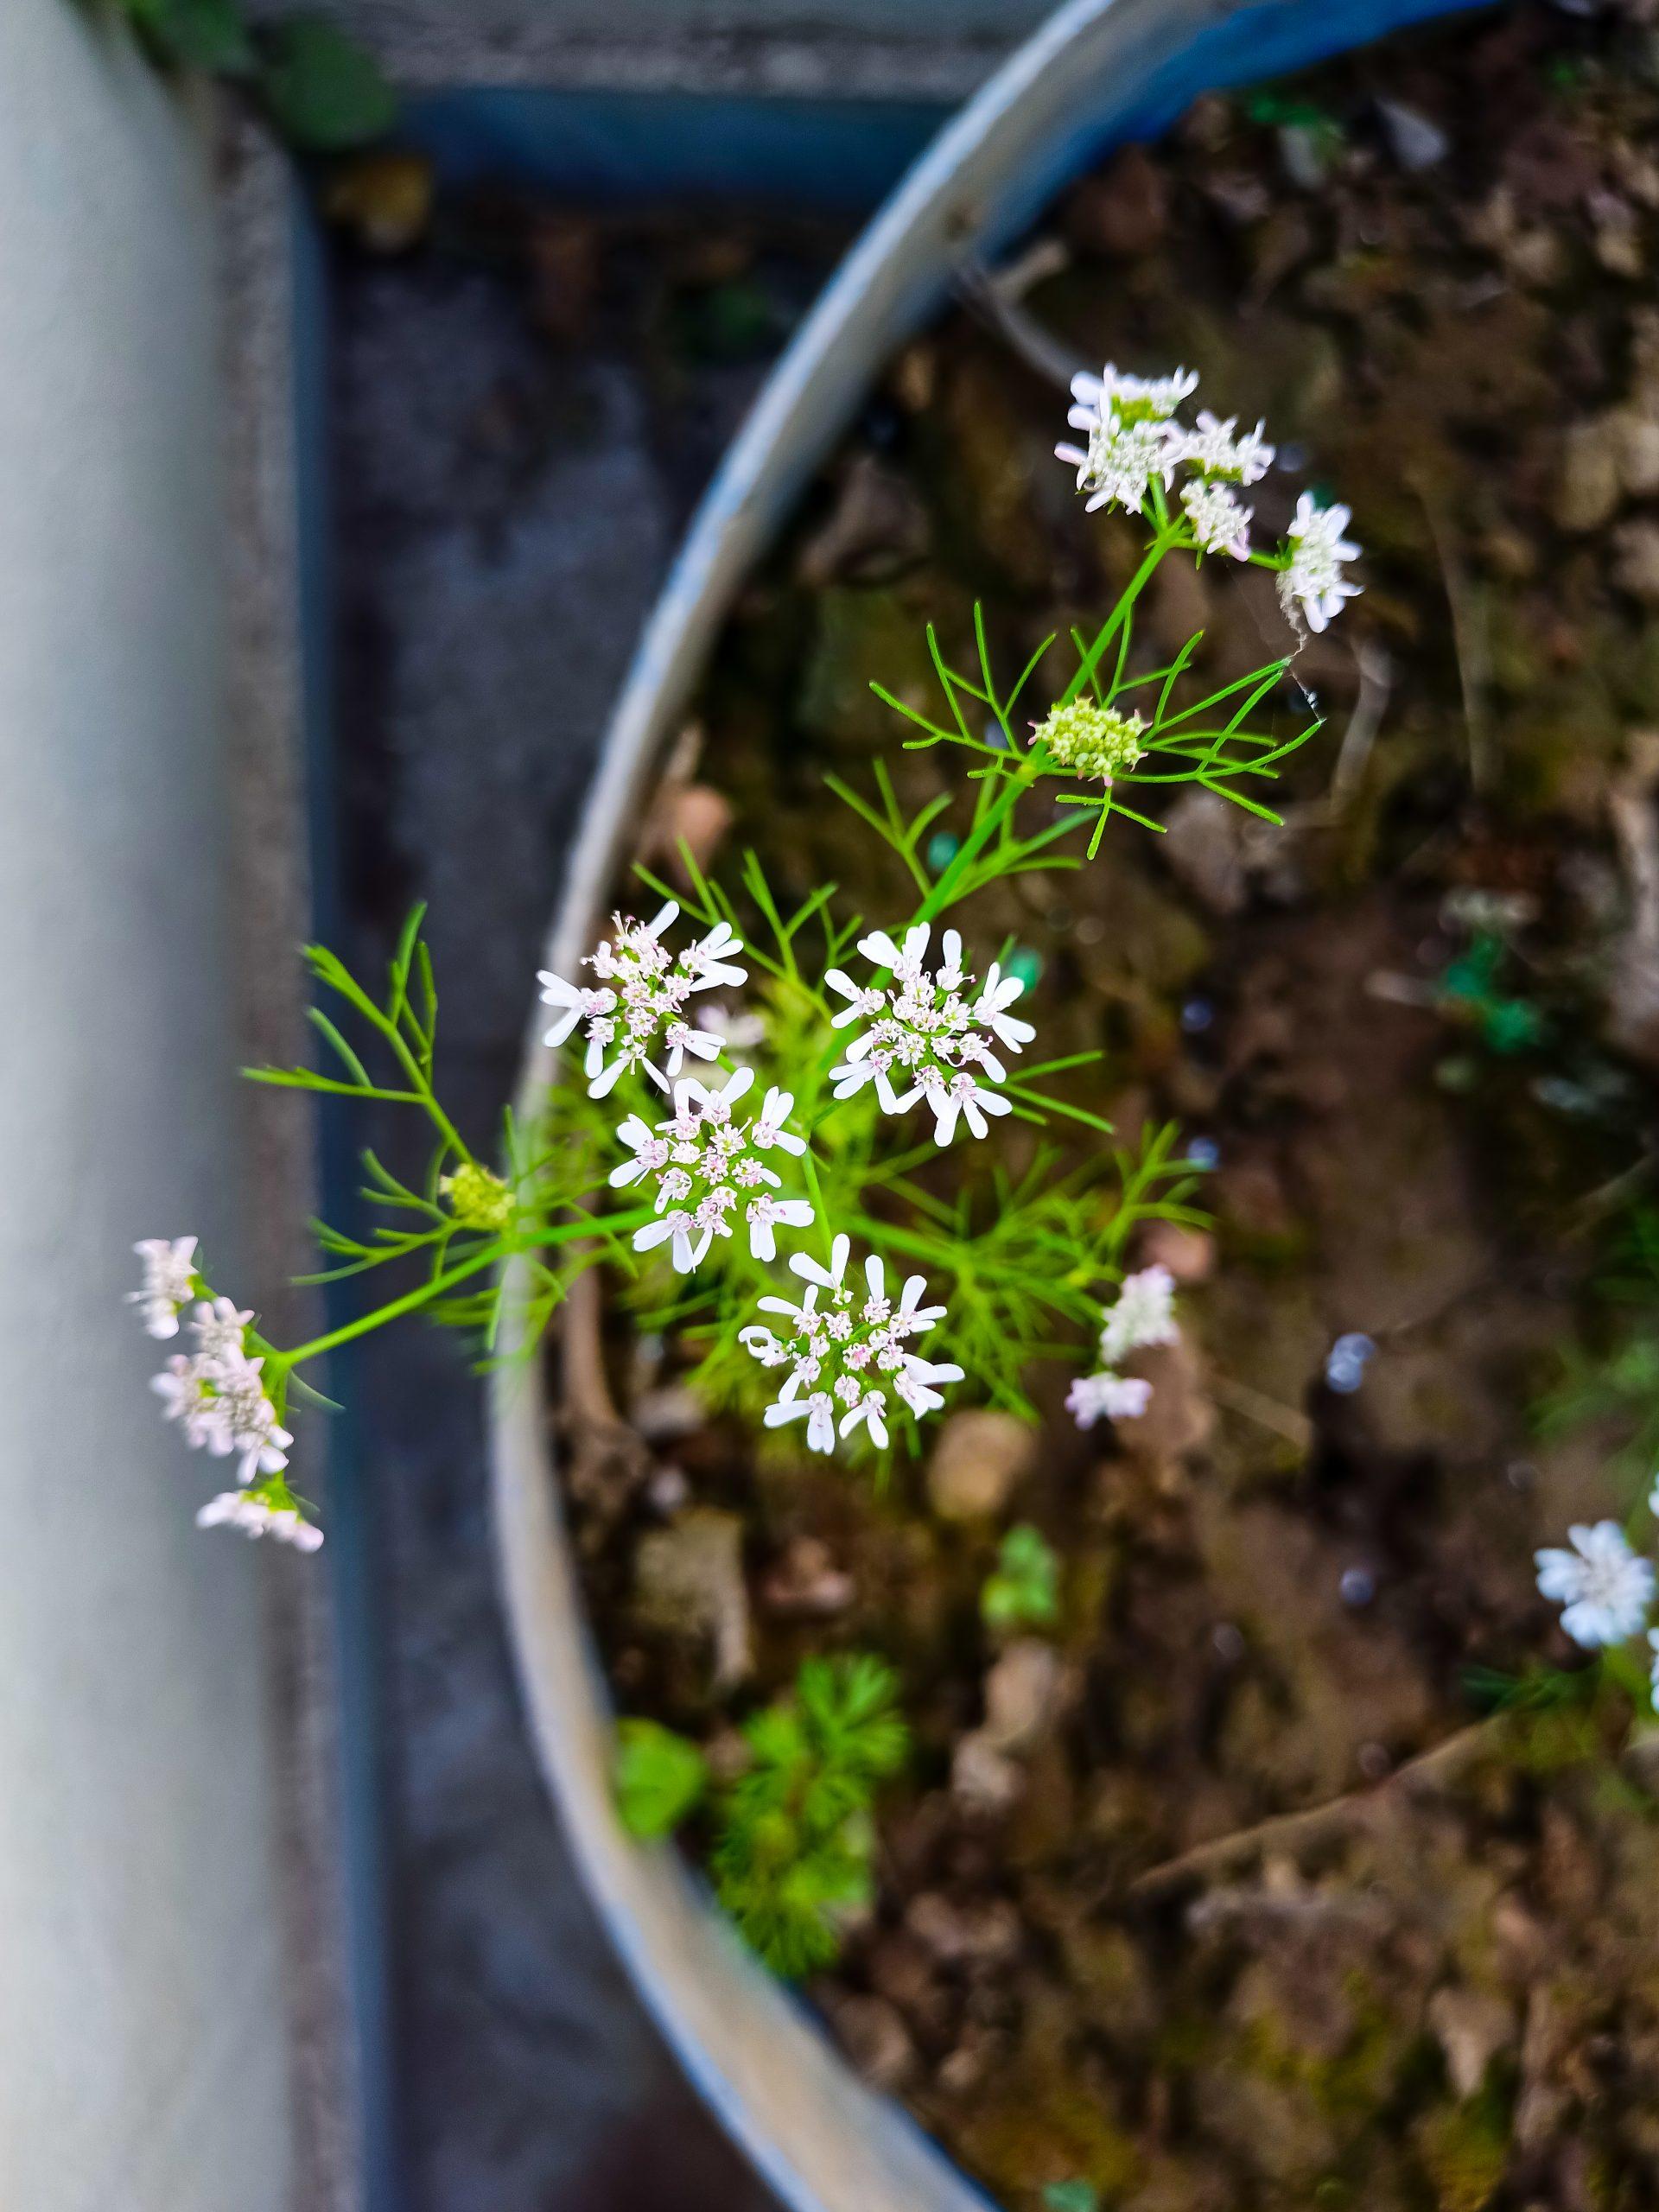 Coriander plant flowers